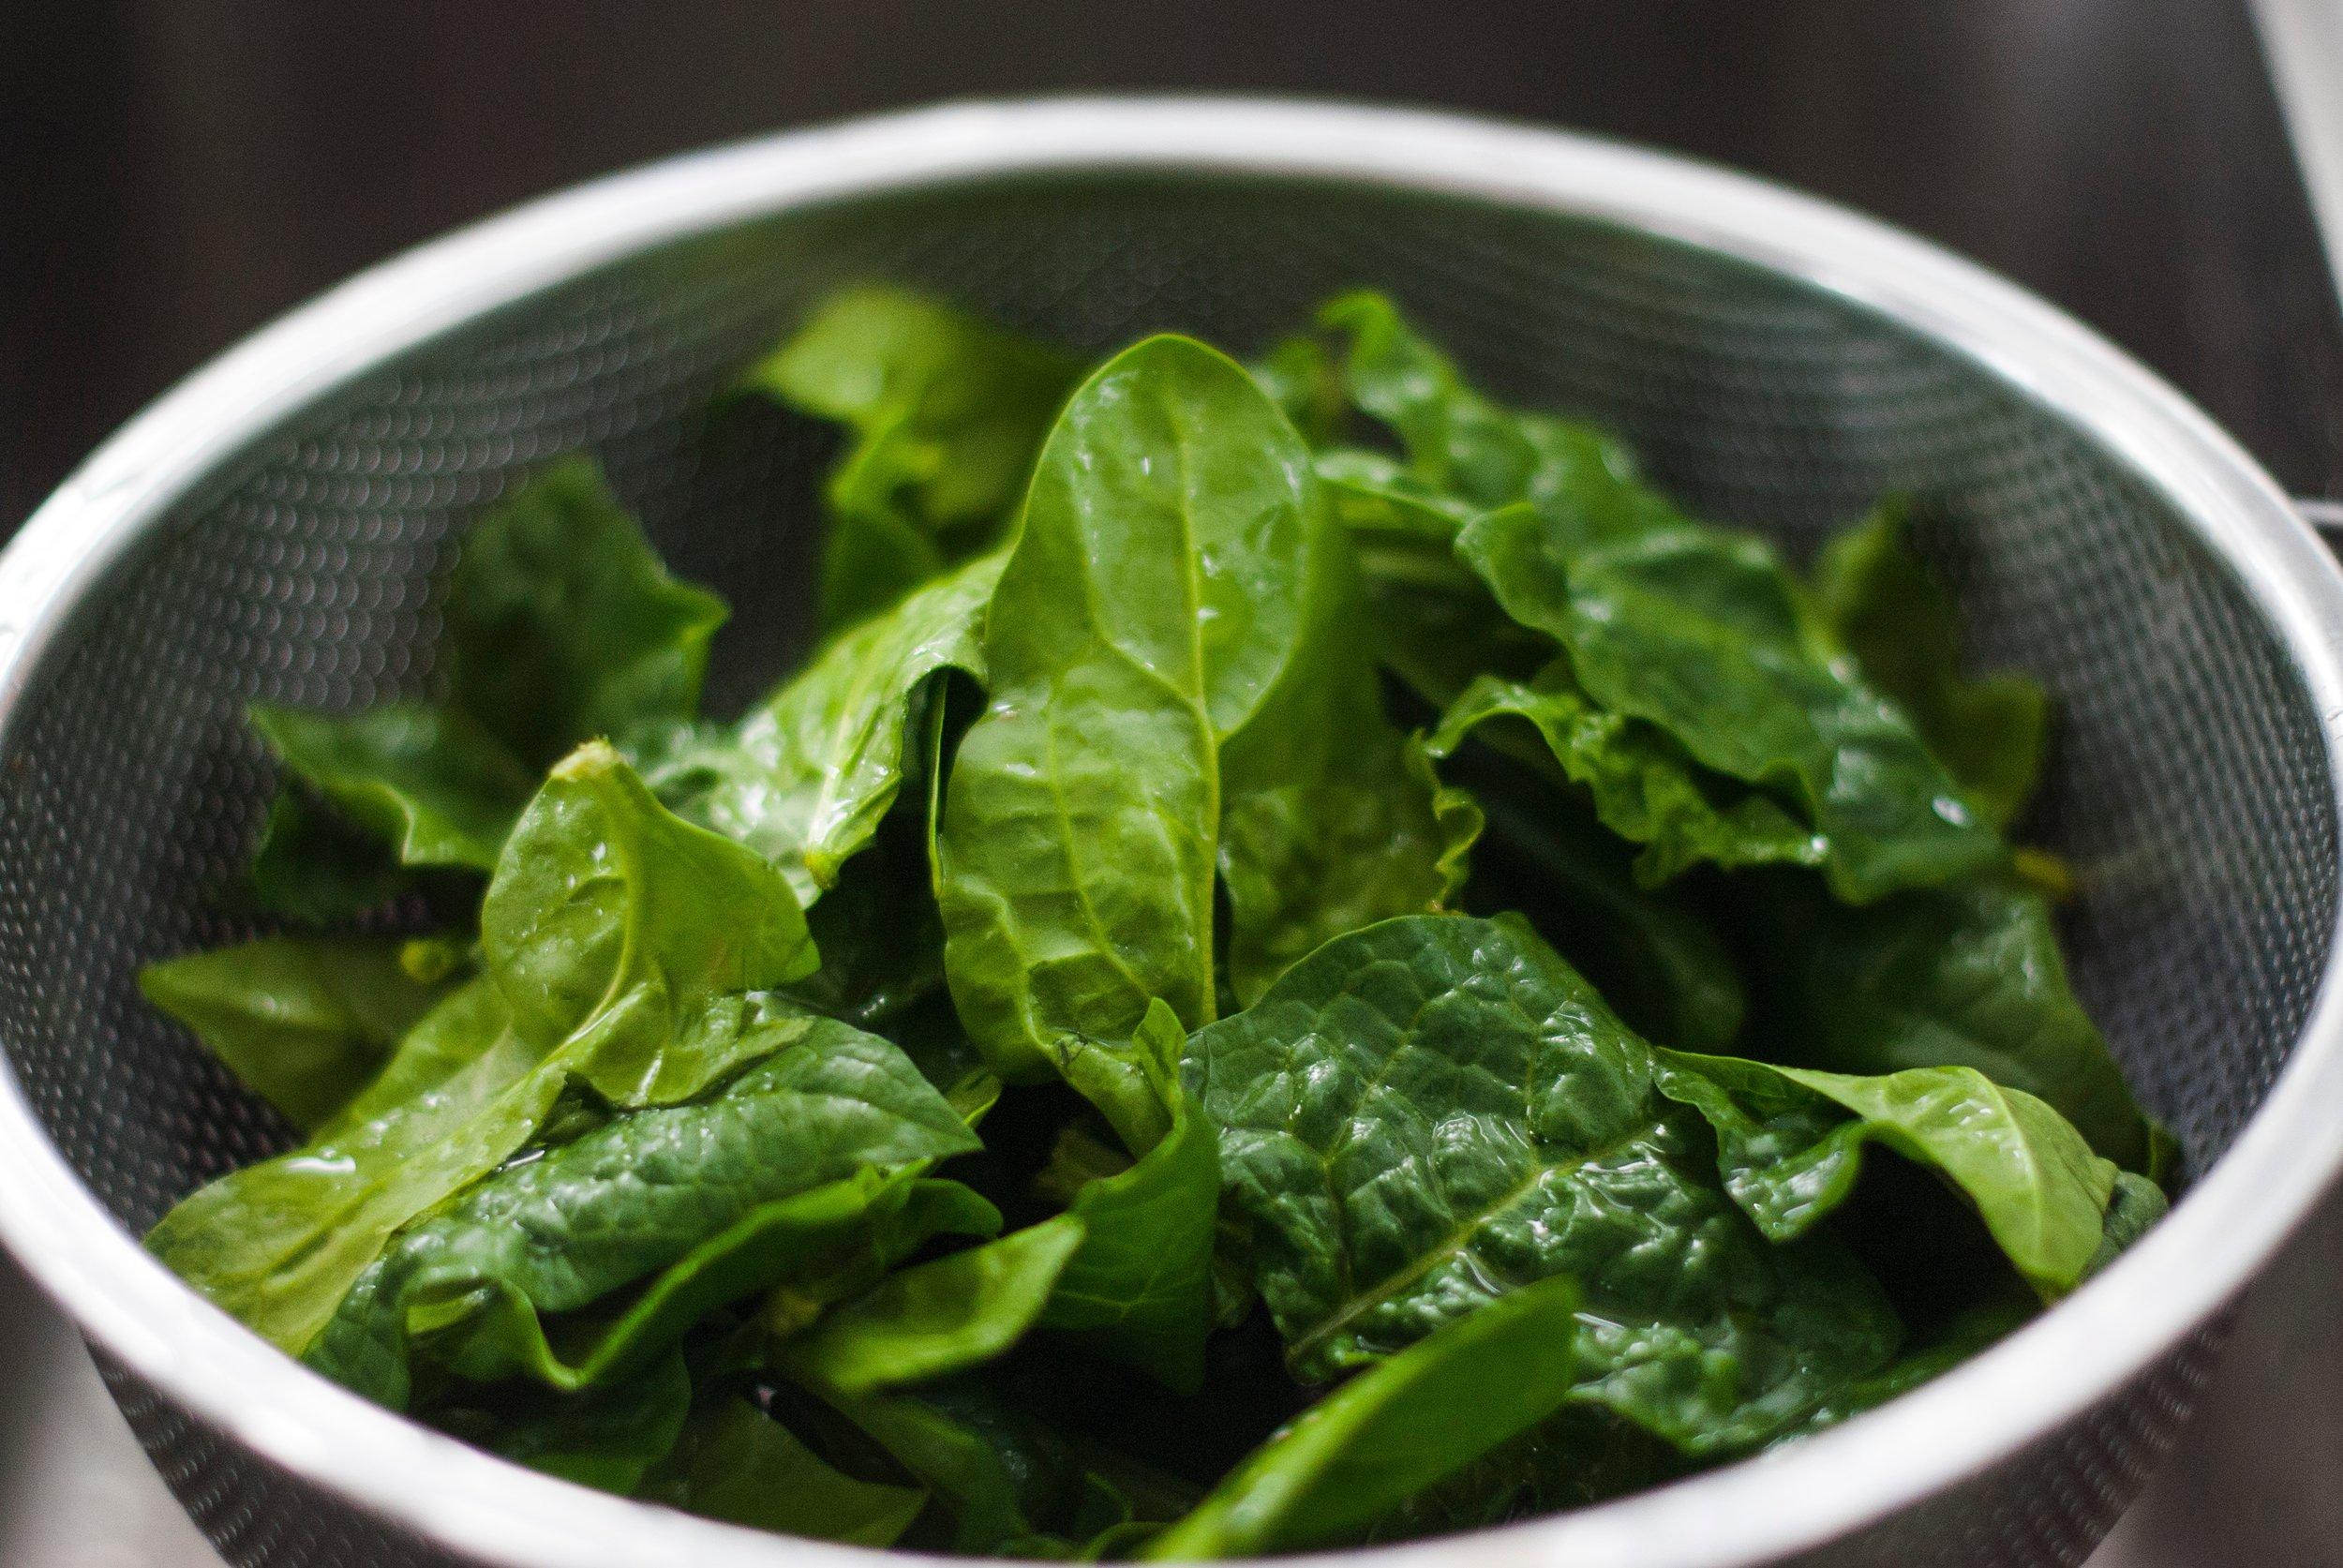 2. Spinach -